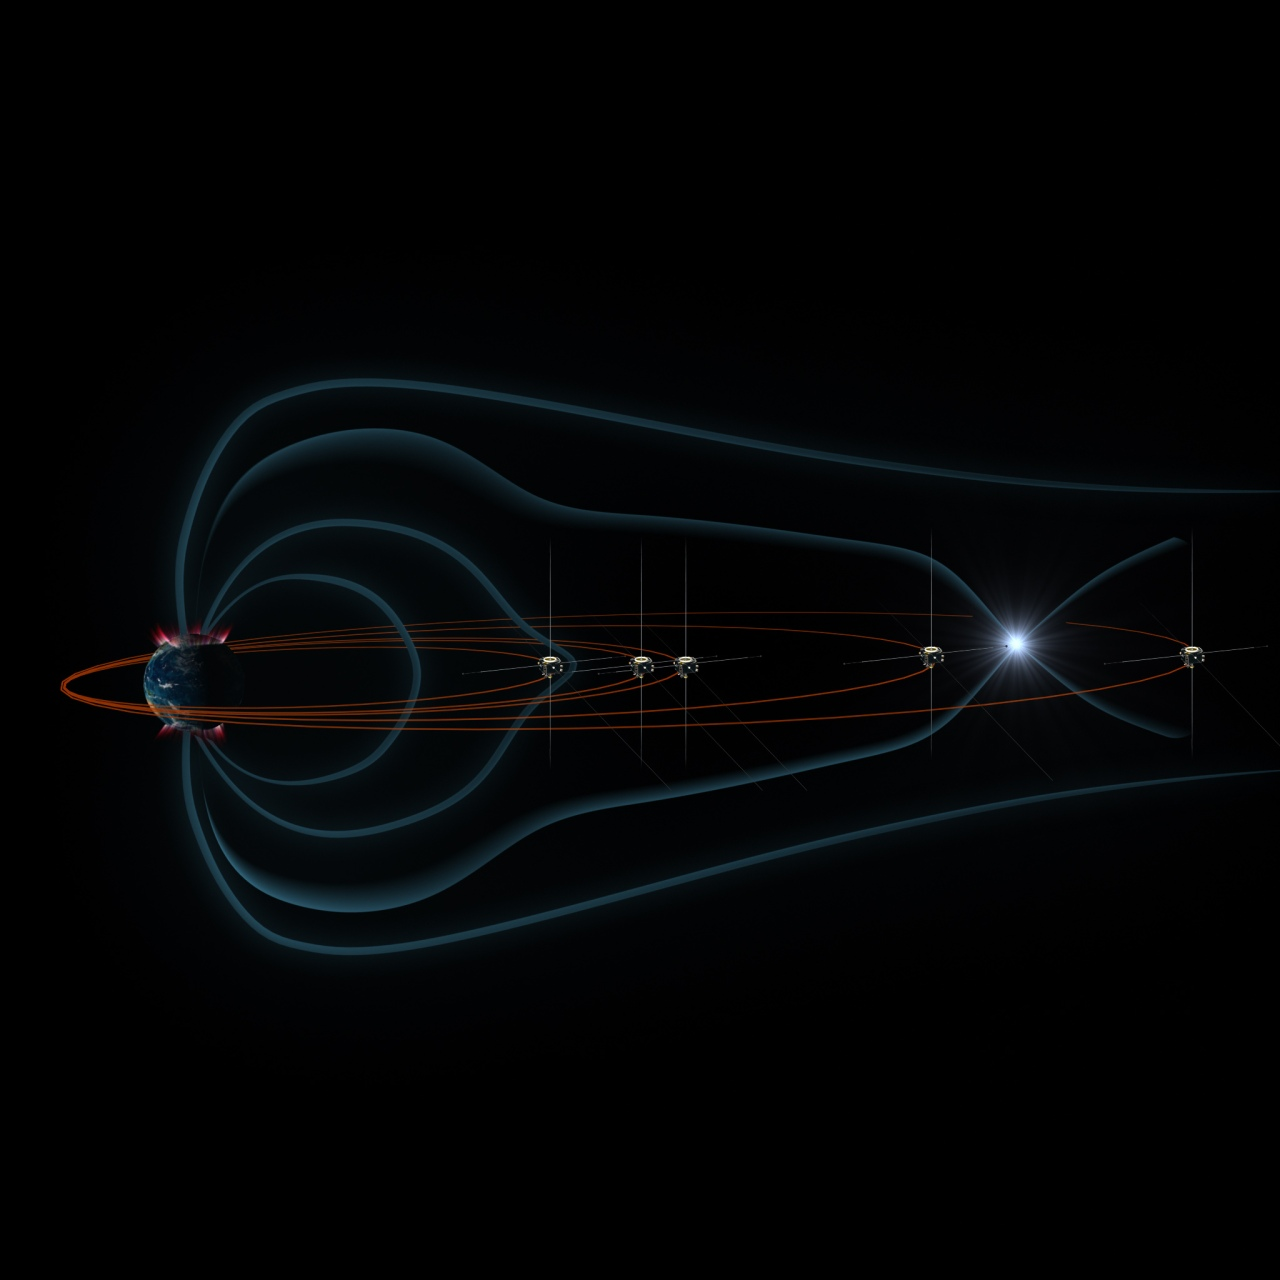 http://science1.nasa.gov/science-news/science-at-nasa/2008/24jul_plasmabullets/